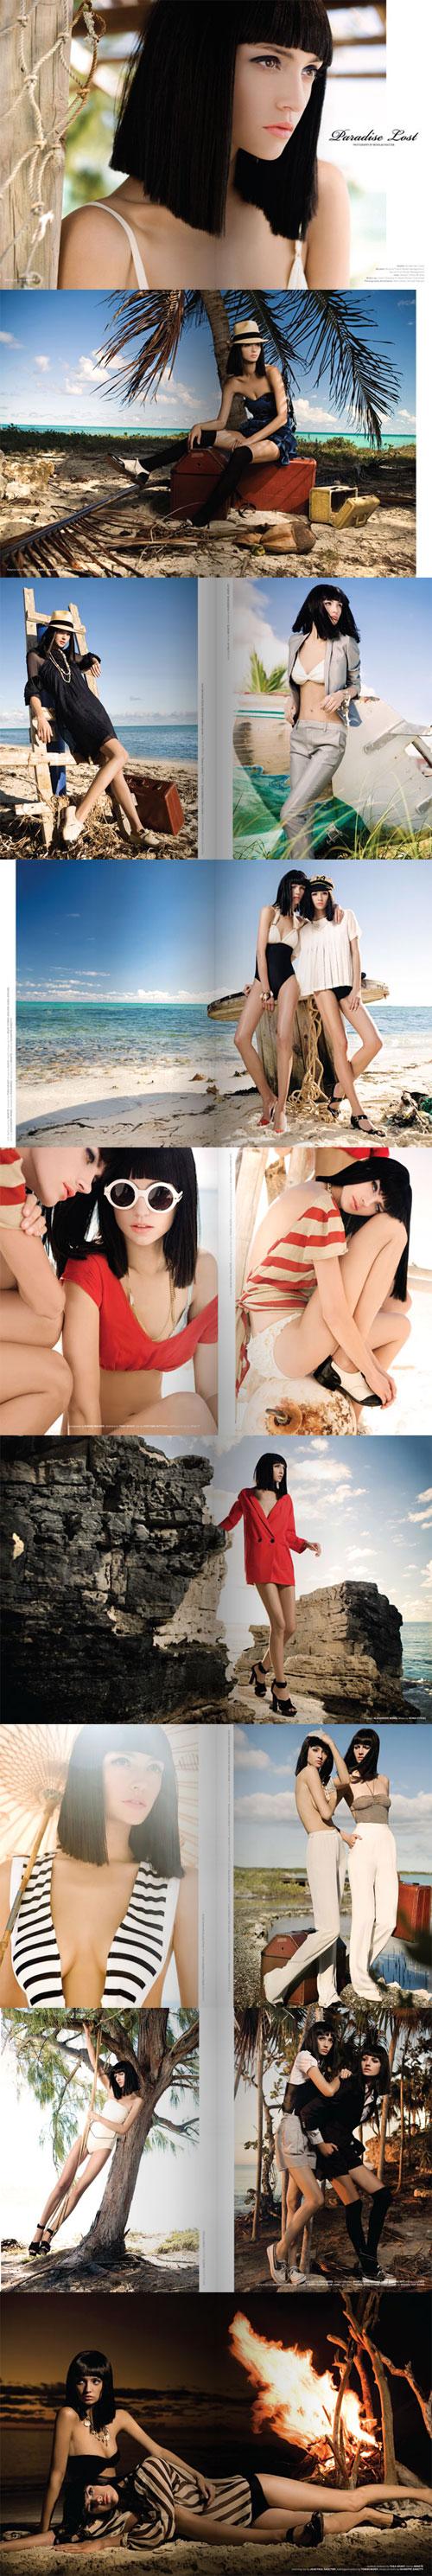 Jun 10, 2008 Nicholas Routzen Nikkistyle magazine